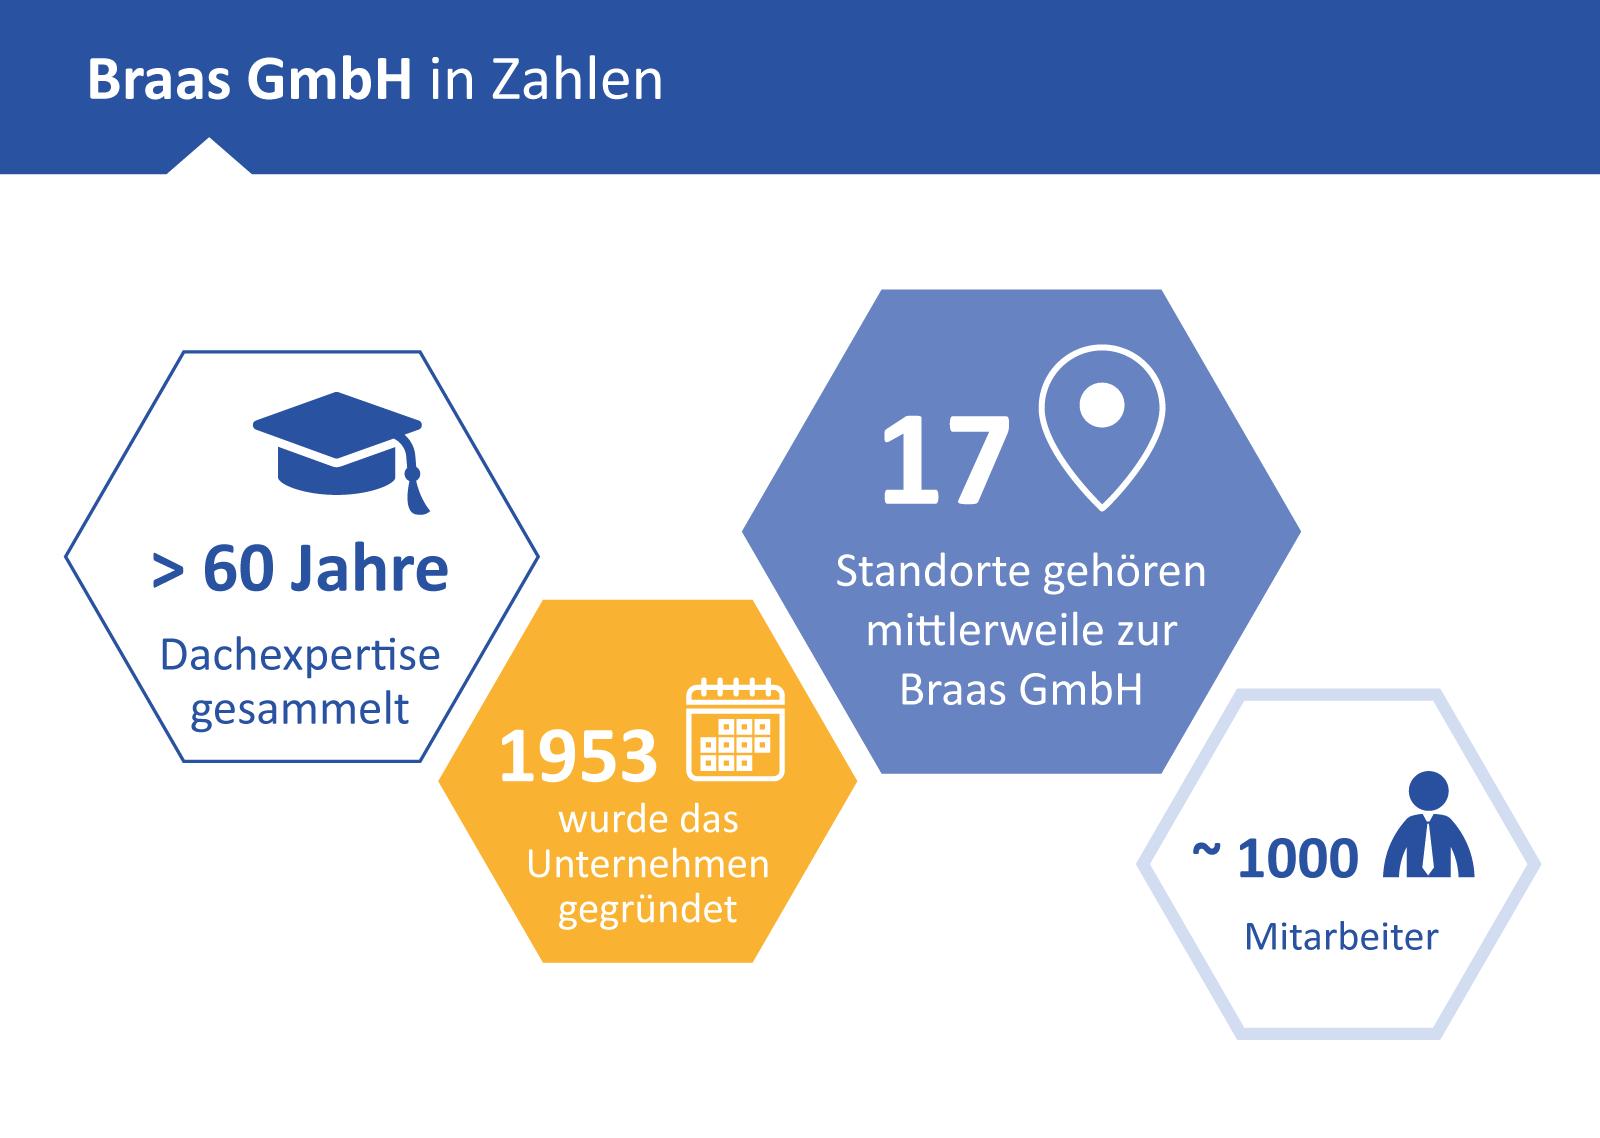 Braas GmbH in Zahlen | portrino